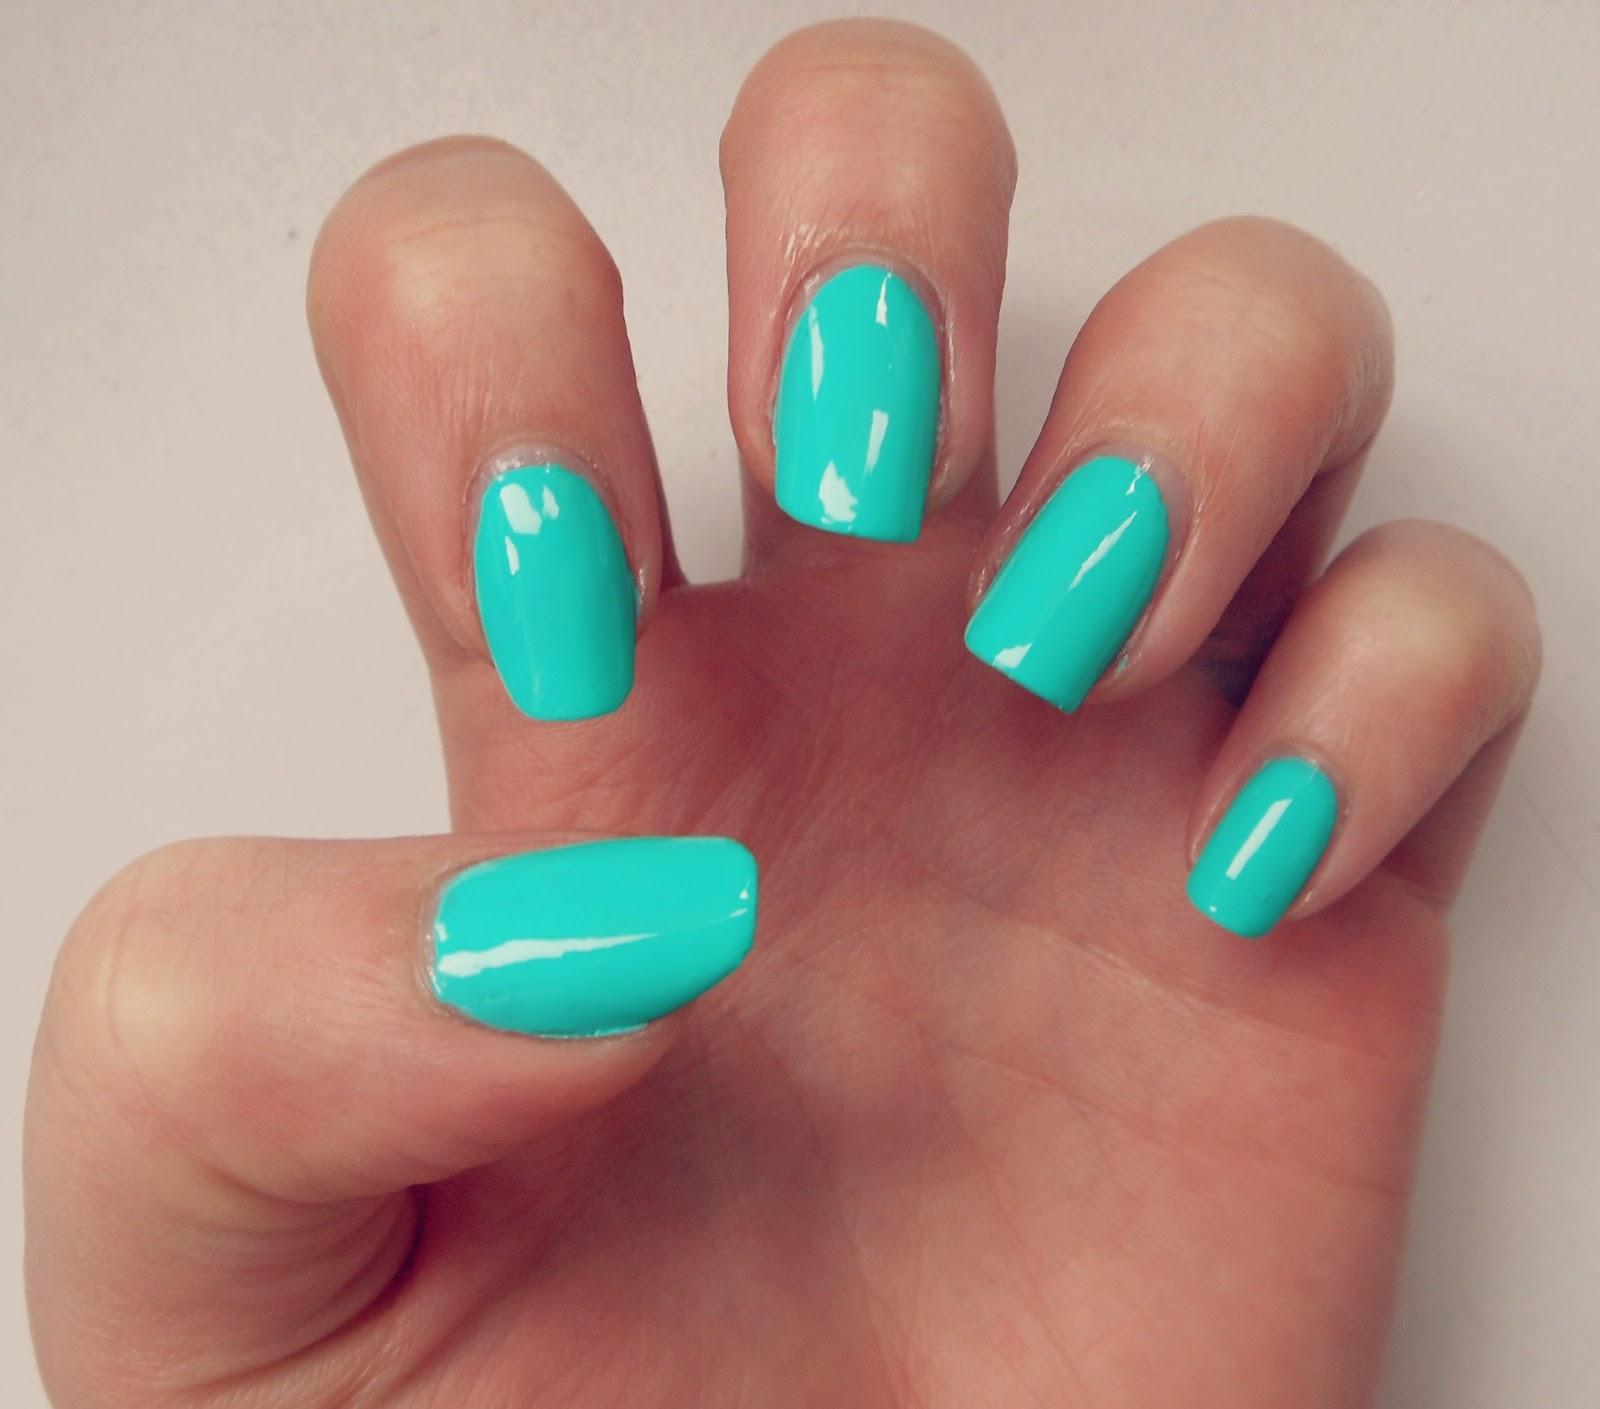 Nail Polish Nice Colors: How To Become Fashionable : 7 Great Nail Polish Colours